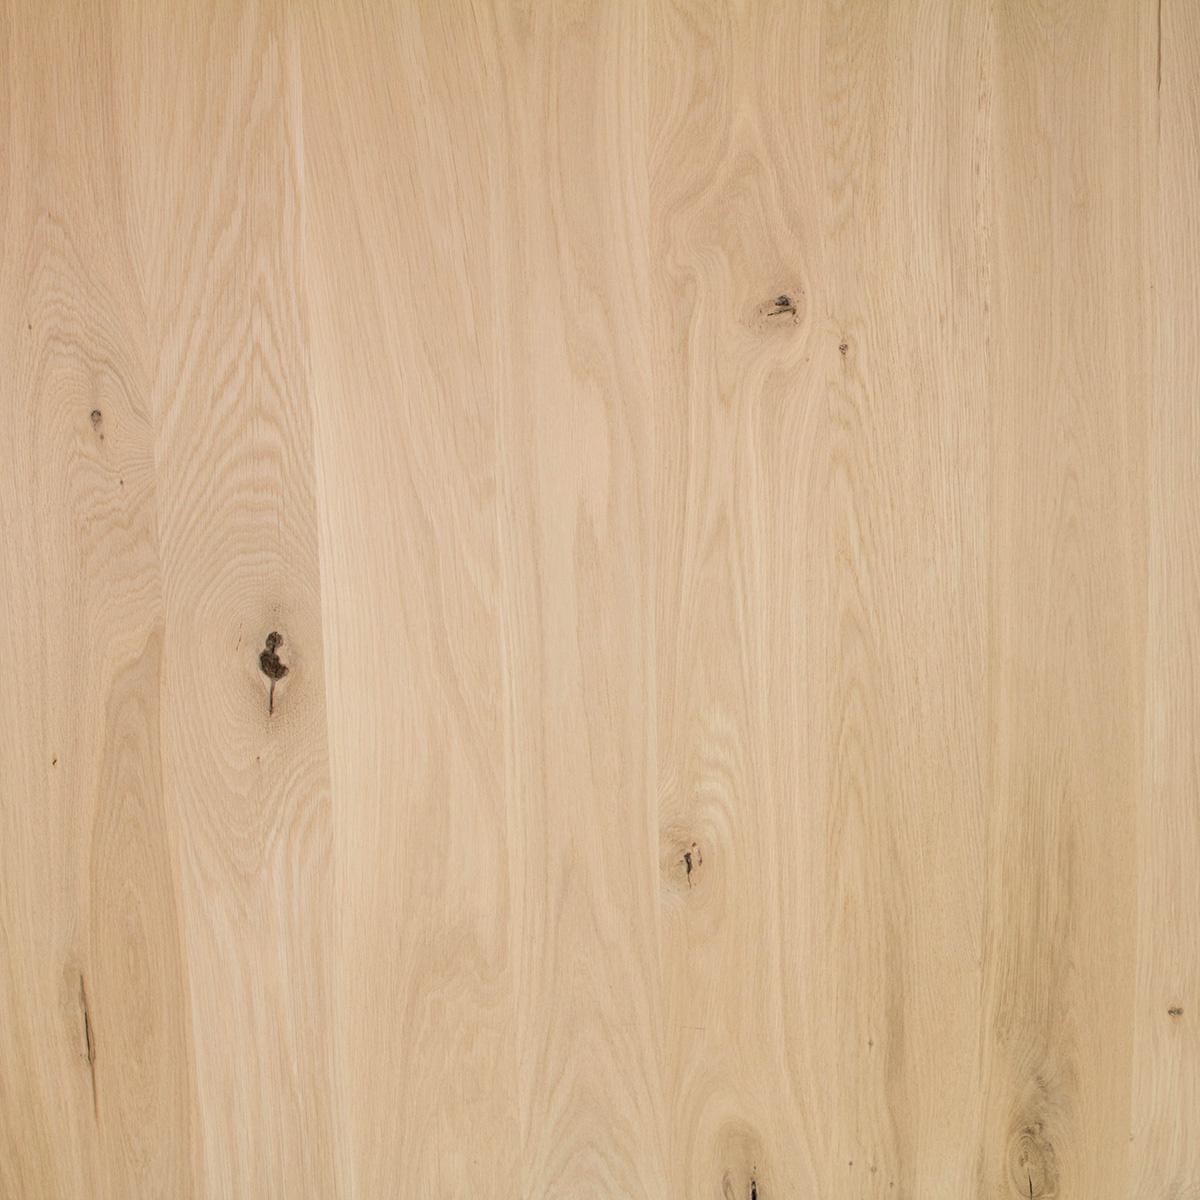 Arbeitsplatte Eiche massiv - 4 cm dick - 122x140-300 cm - Eichenholz rustikal - Massivholz - Verleimt & künstlich getrocknet (HF 8-12%)